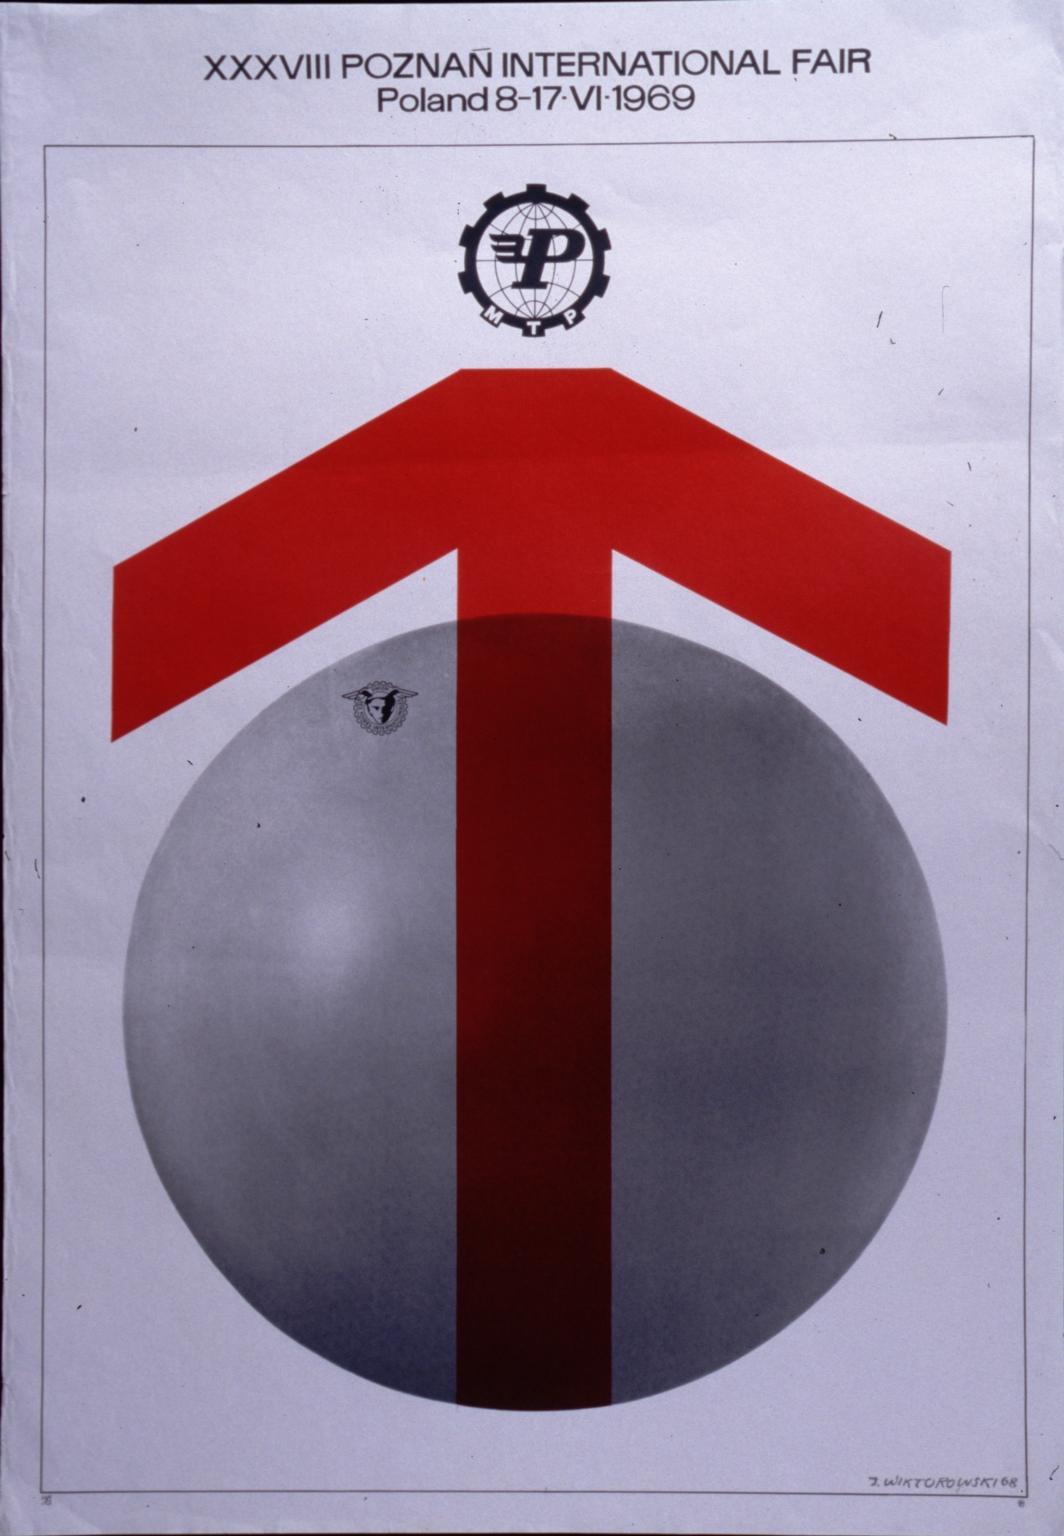 XXXVIII PoznanInternational Fair, Poland, 8-17-VI, 1969